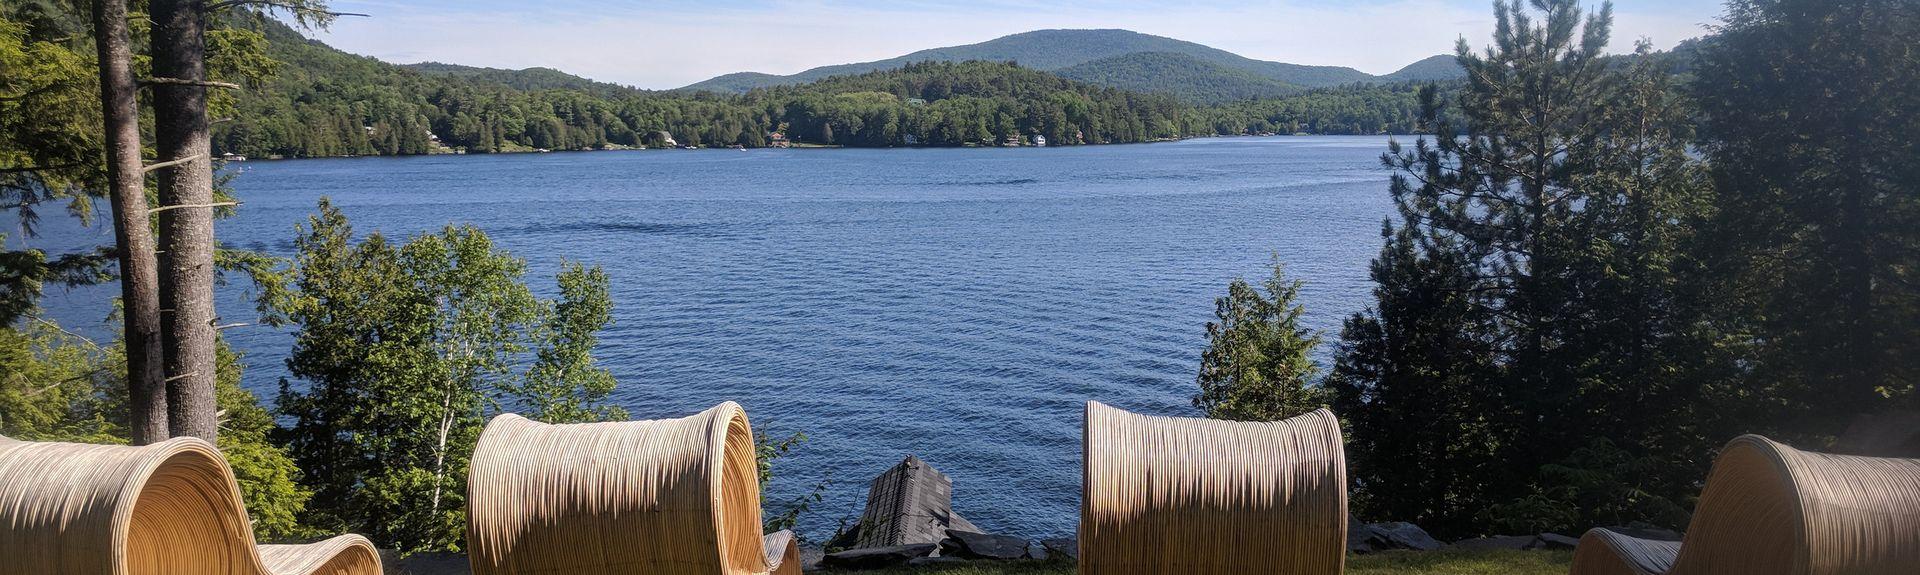 Joes Pond, Vermont, USA